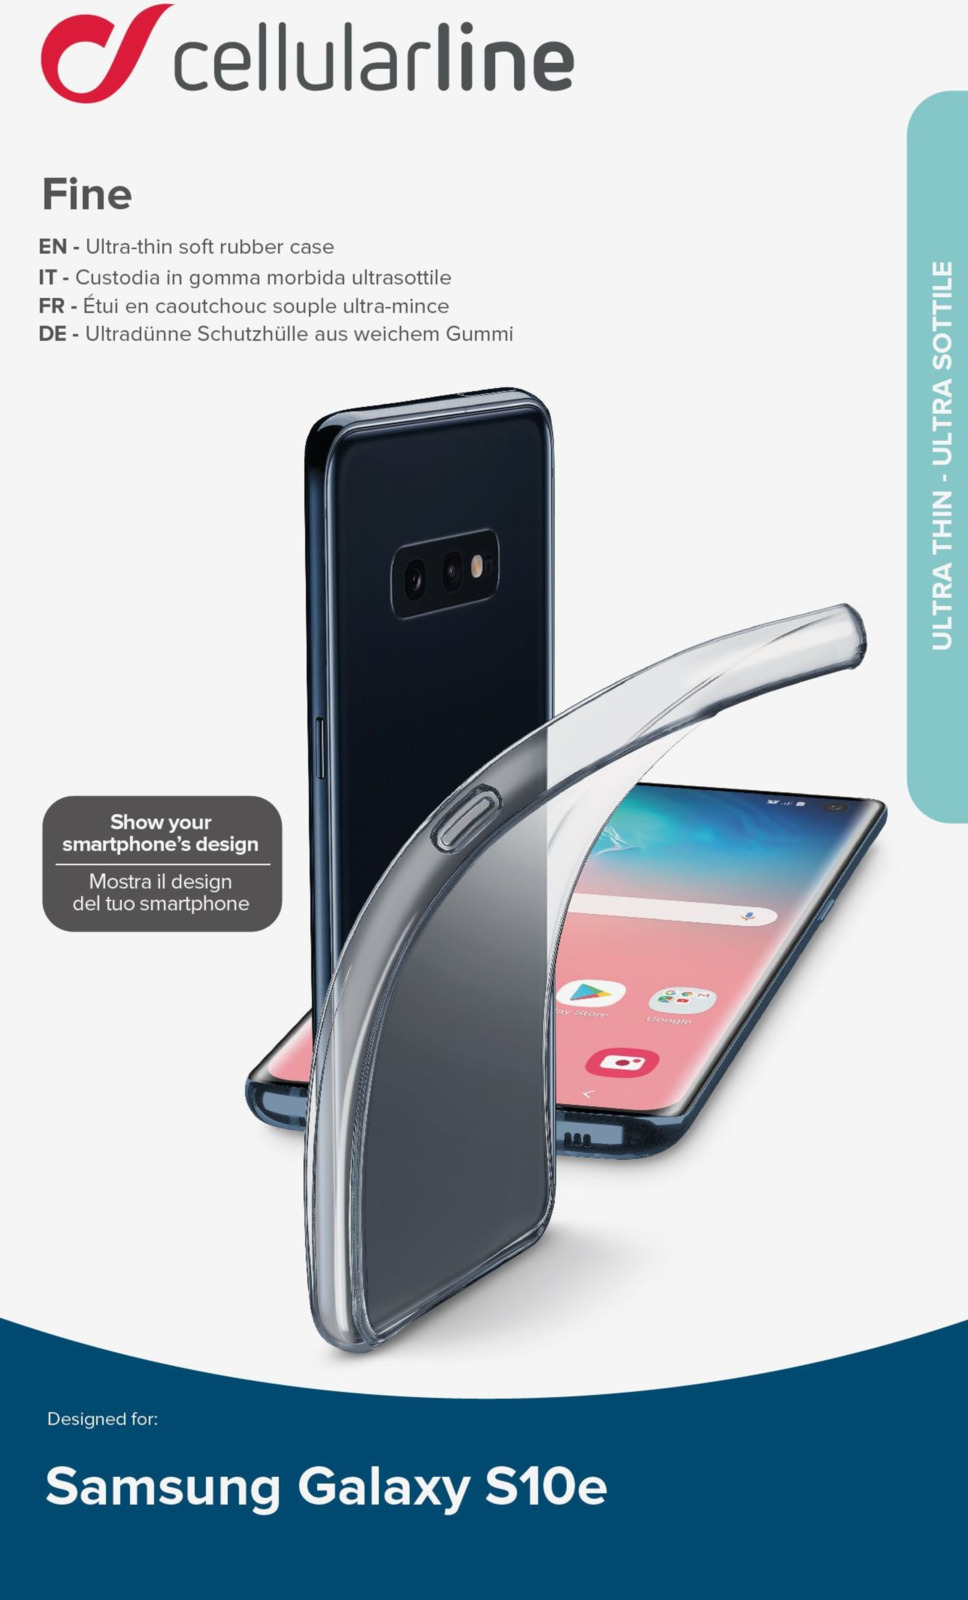 Чехол Cellularline для Samsung Galaxy S10 Lite, FINECGALS10LT, прозрачный чехол для samsung galaxy s8 cellularline clear duo прозрачный